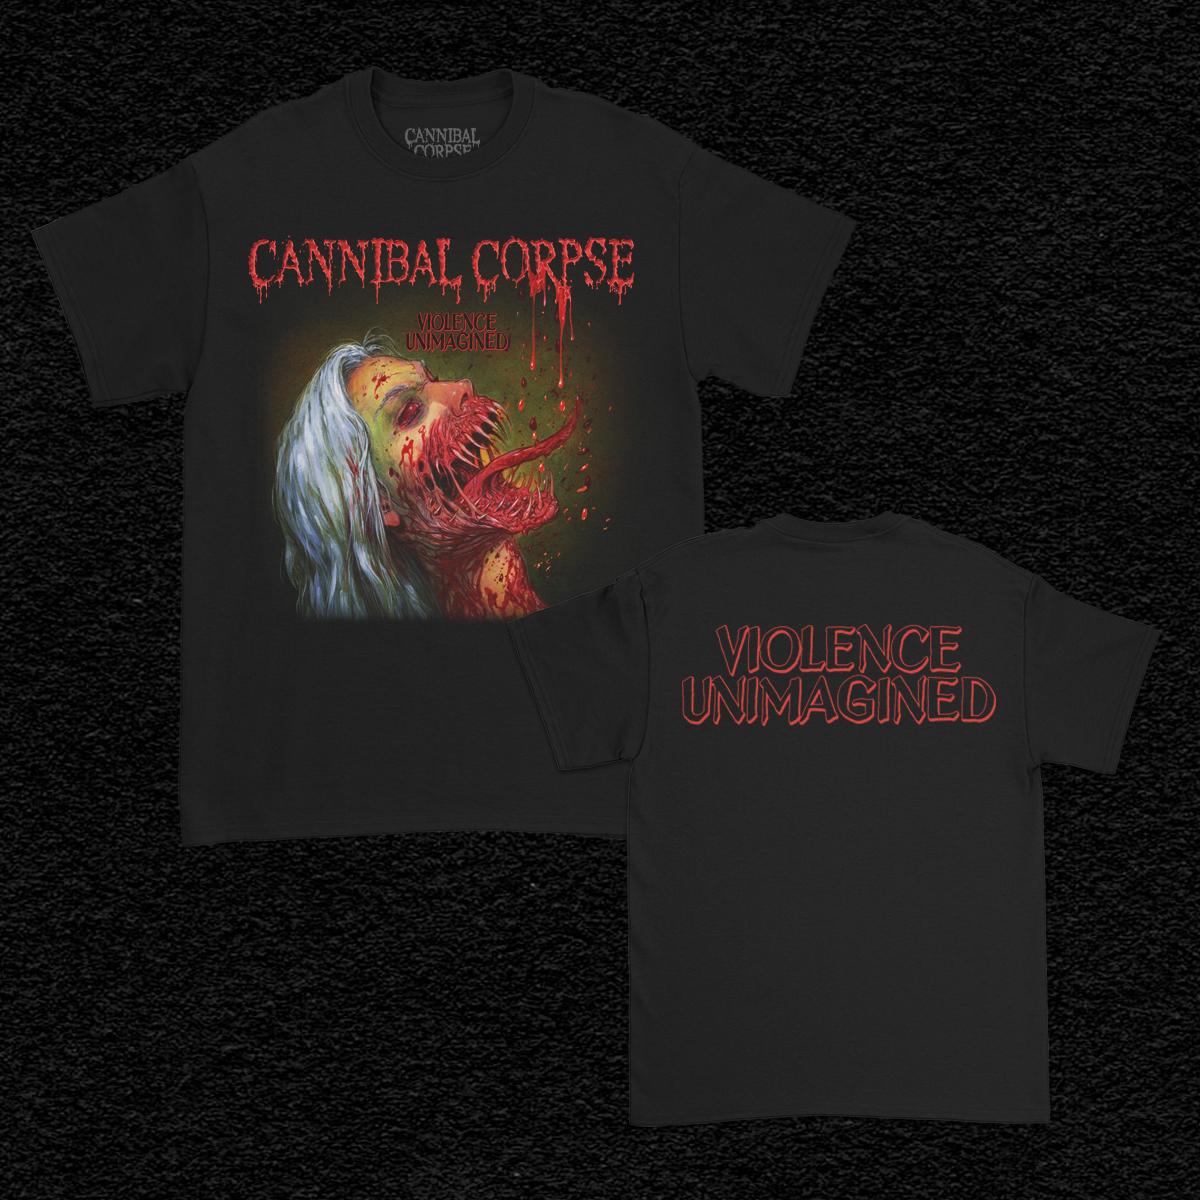 IMAGE | Violence Unimagined T-Shirt (Black)